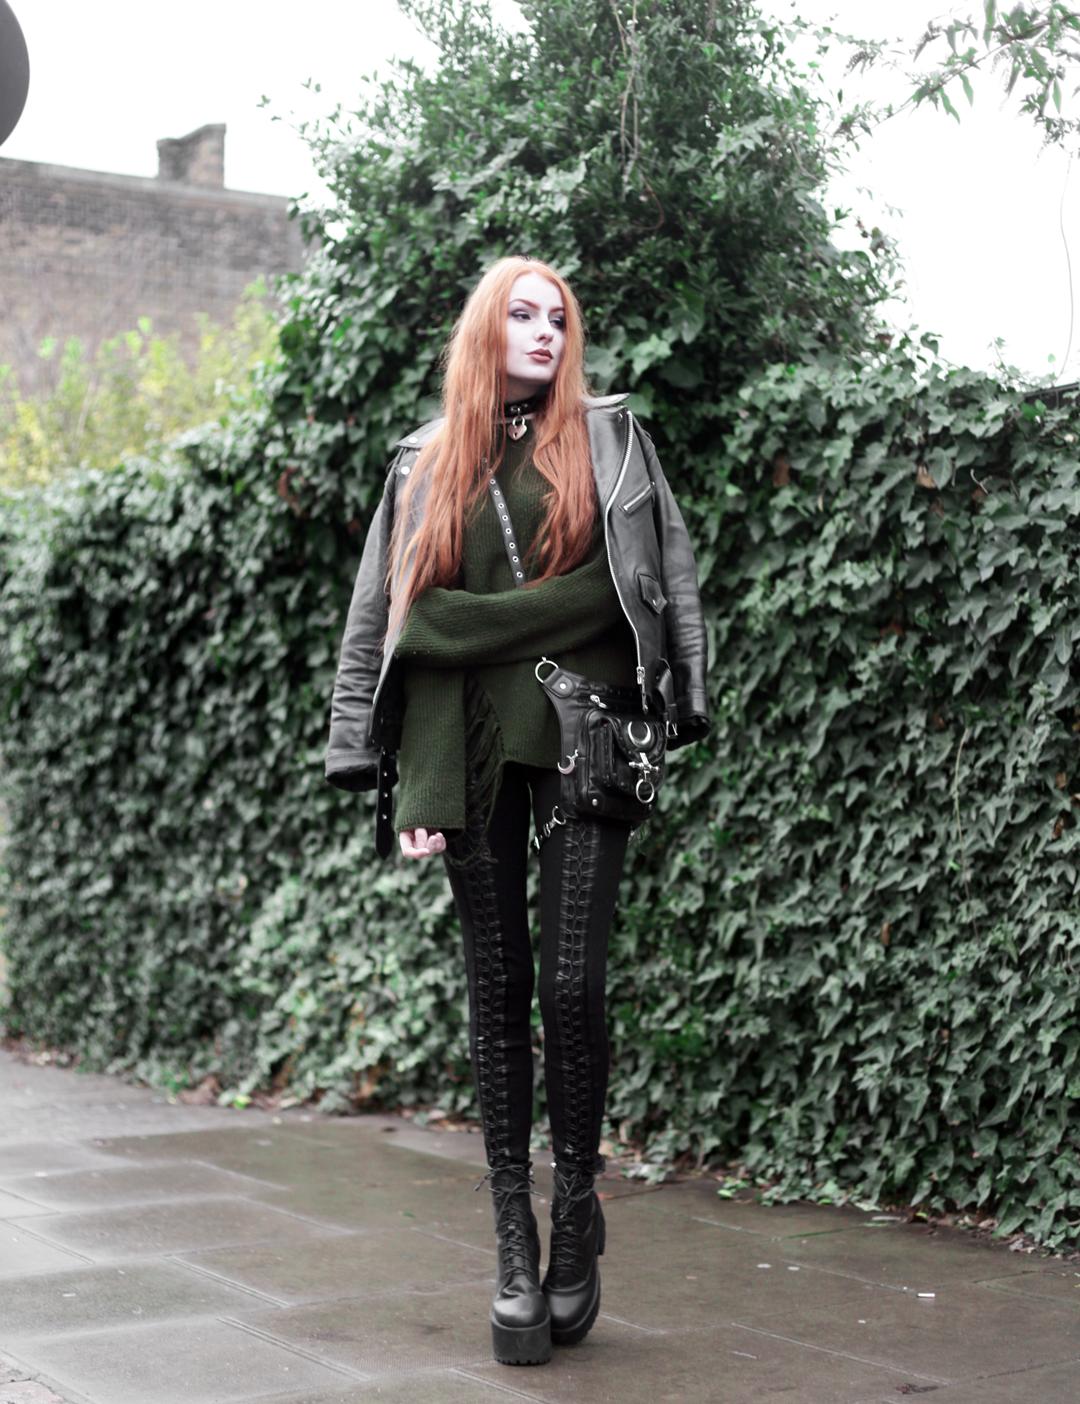 Olivia Emily wears Biker Jacket, Asos Bones Oversized jumper, Restyle pl harness bag, Stylestalker lace up leggings trousers, Unif scosche boots